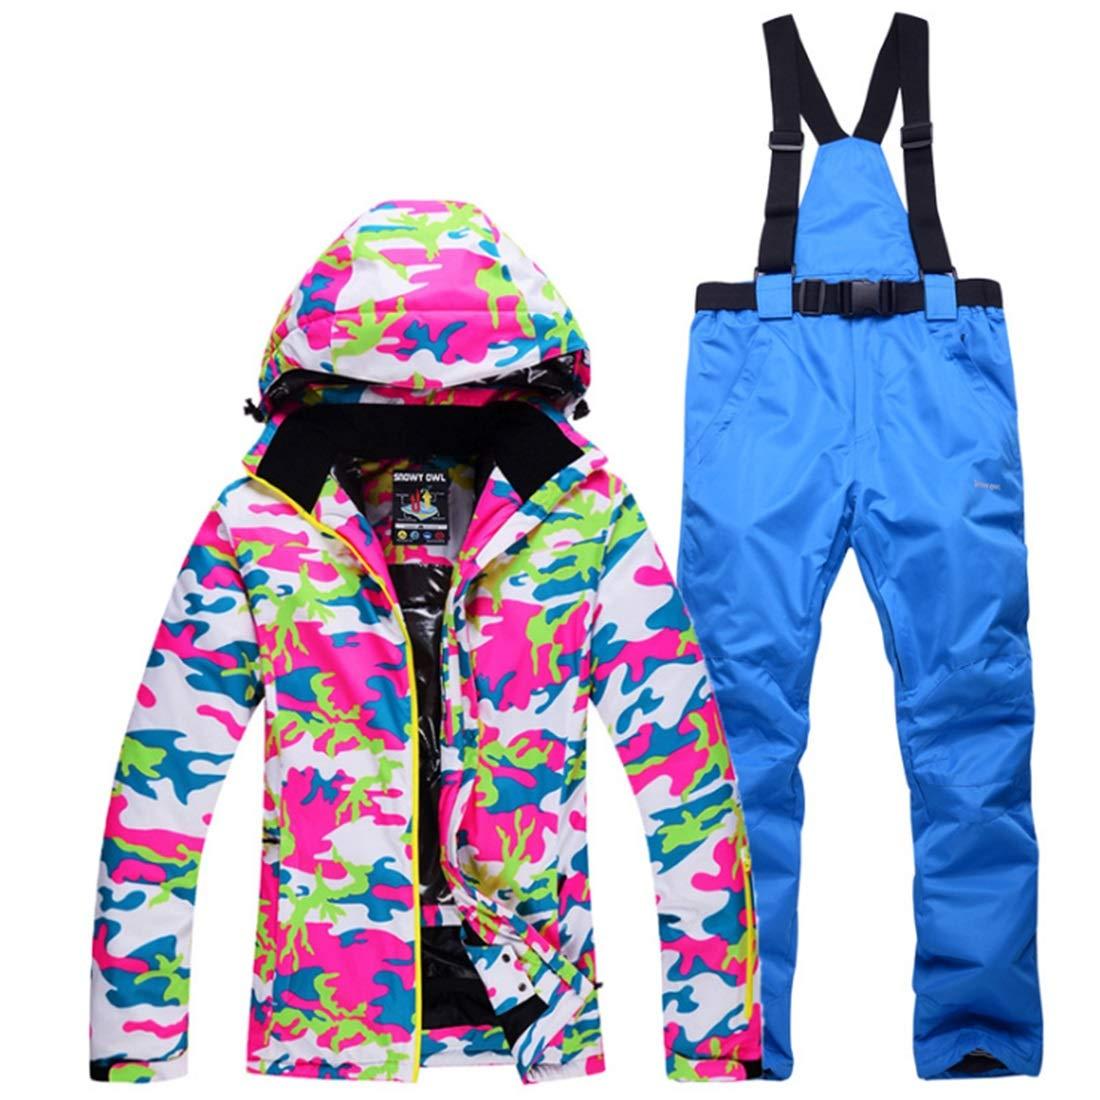 DAMEIFEITUN 女性用マウンテン スキー ジャケット防水防風暖かい冬レイン コート(s-xl) (色 : 04, サイズ : L)  Large